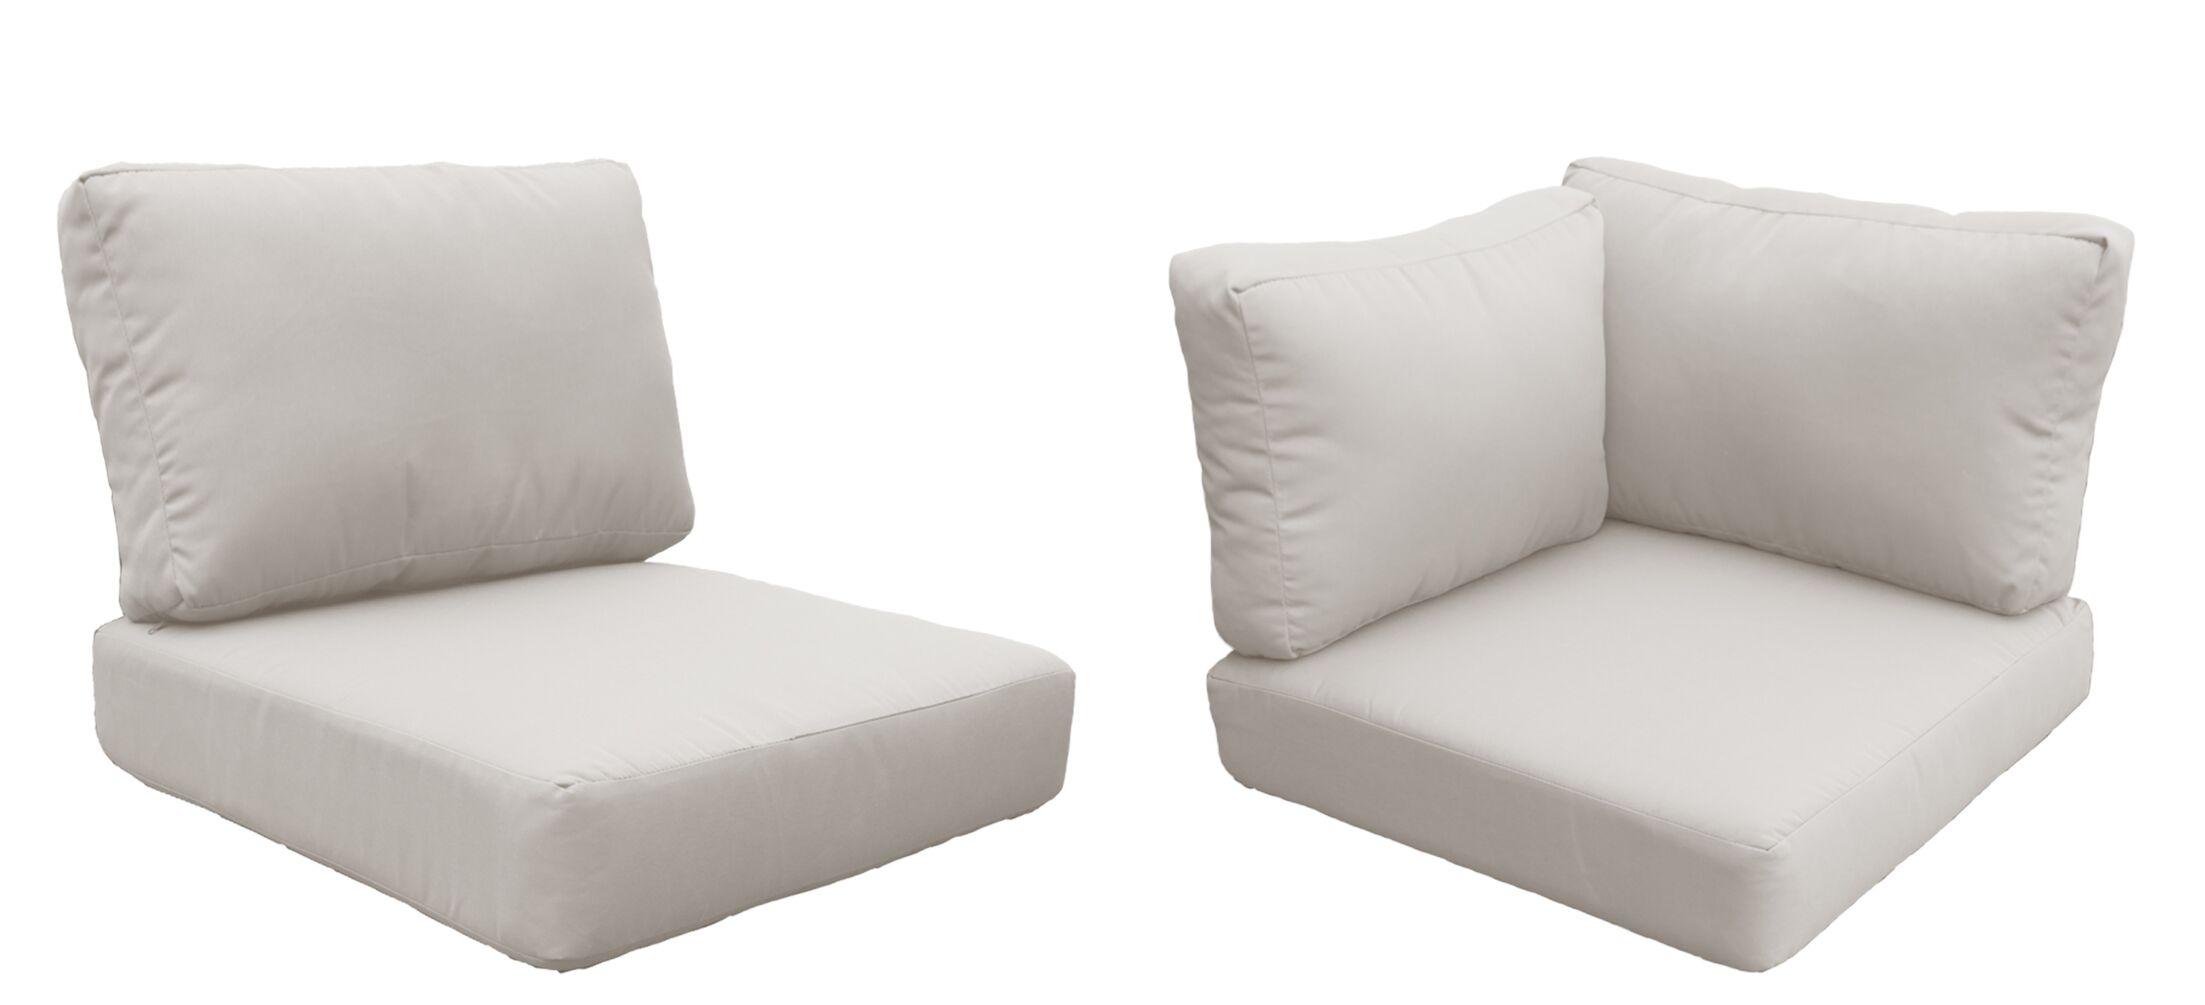 Fairmont 19 Piece Outdoor�Lounge Chair Cushion Set Fabric: Cilantro